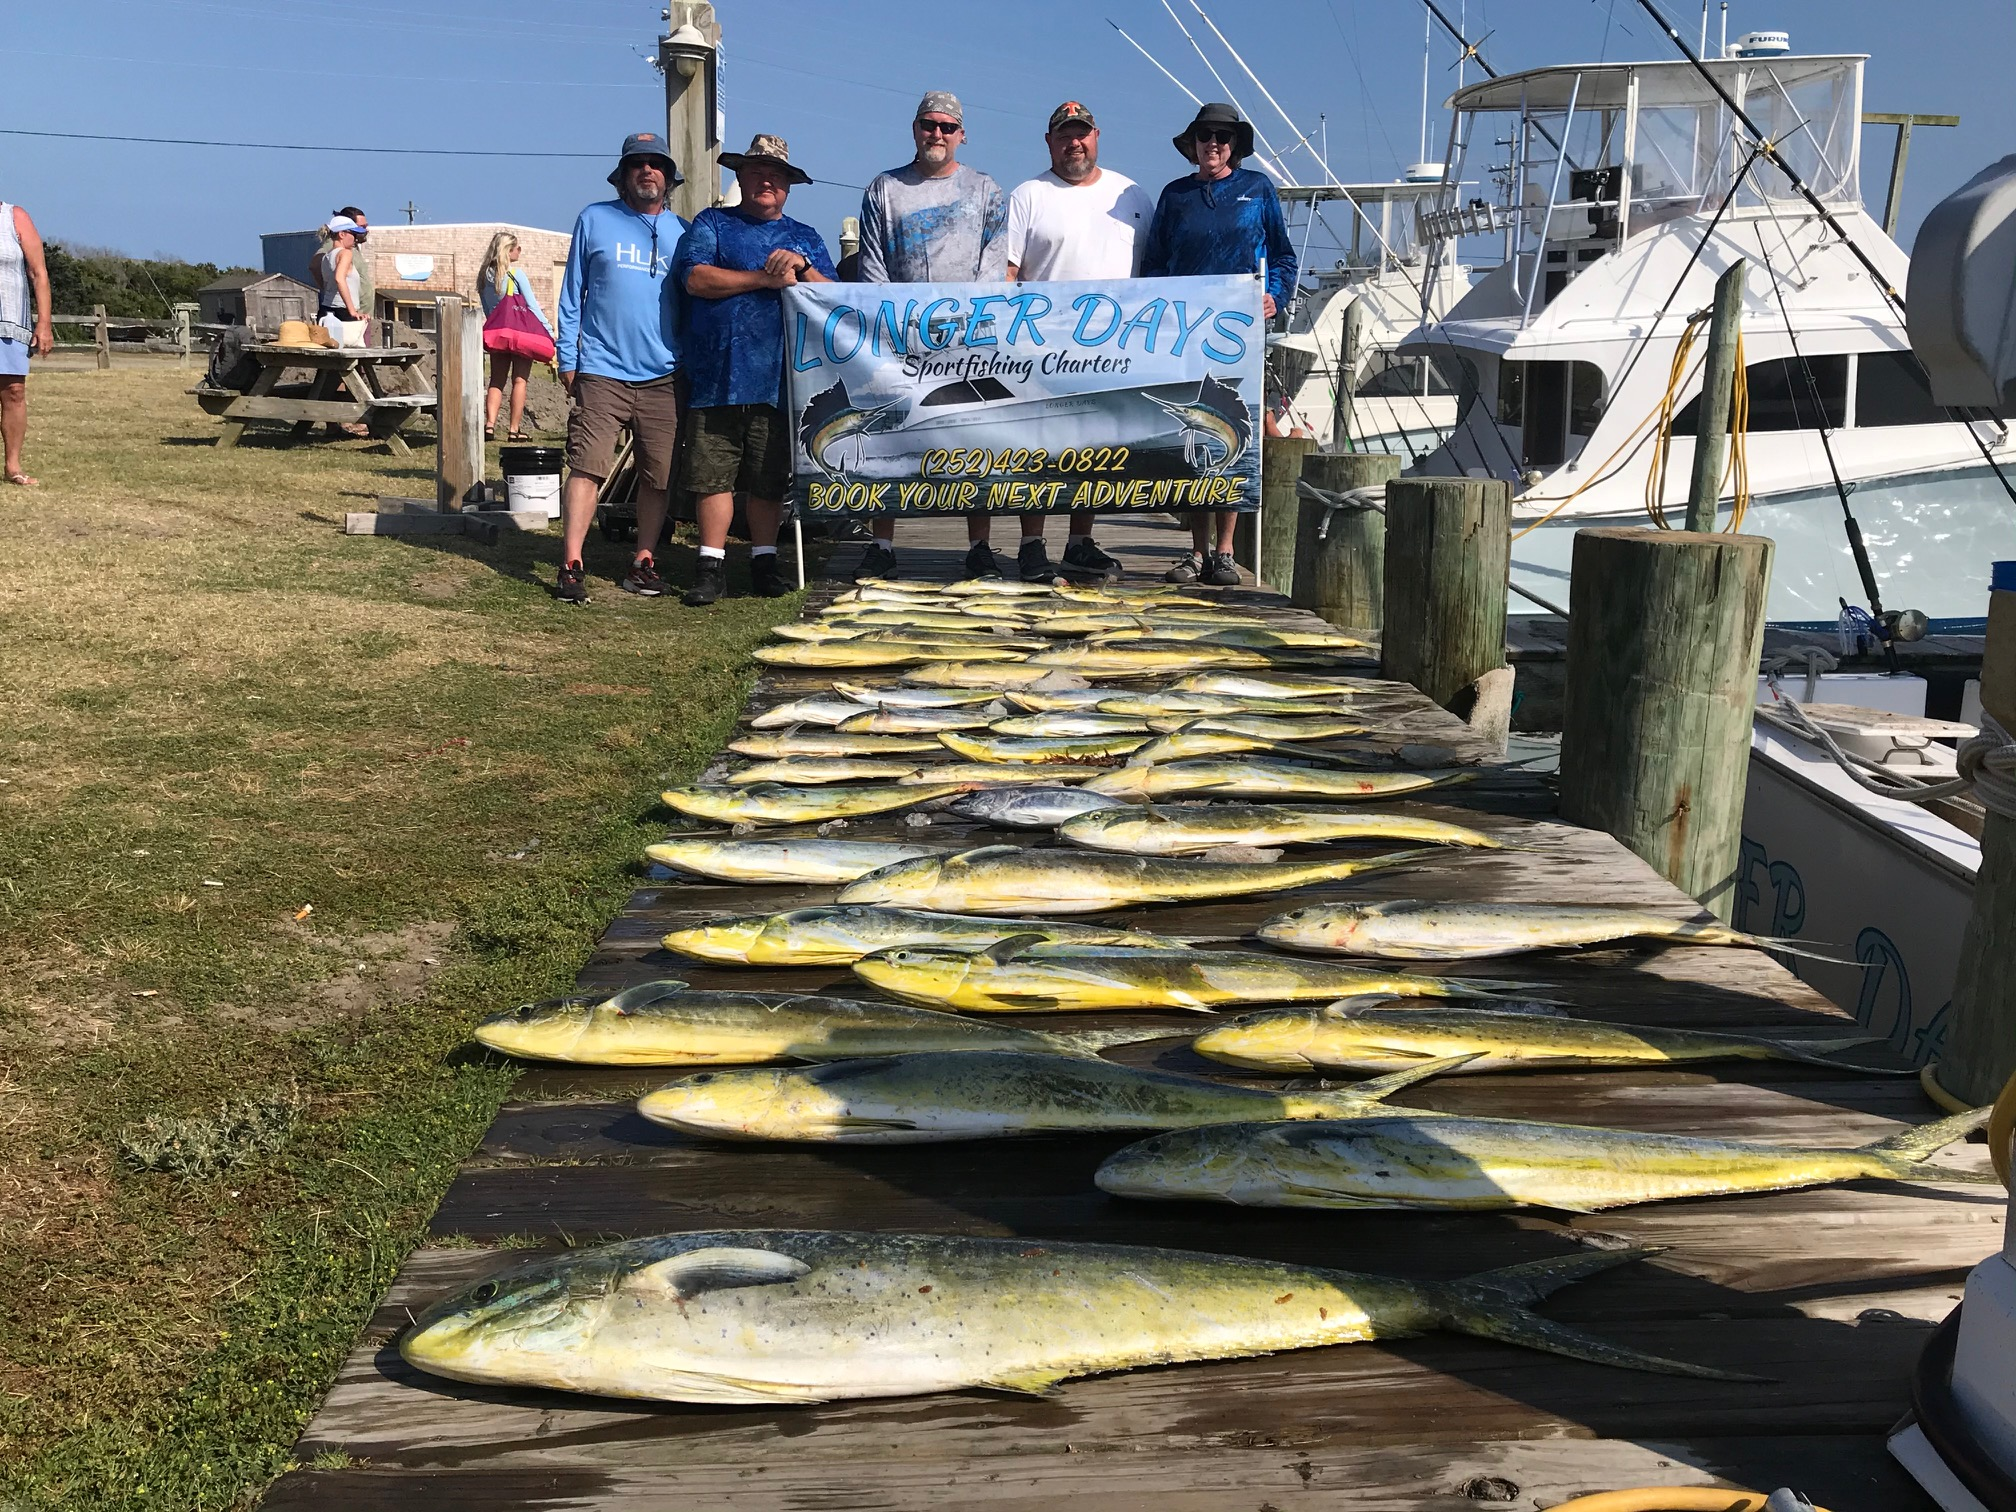 Longer Days Sportfishing Charters